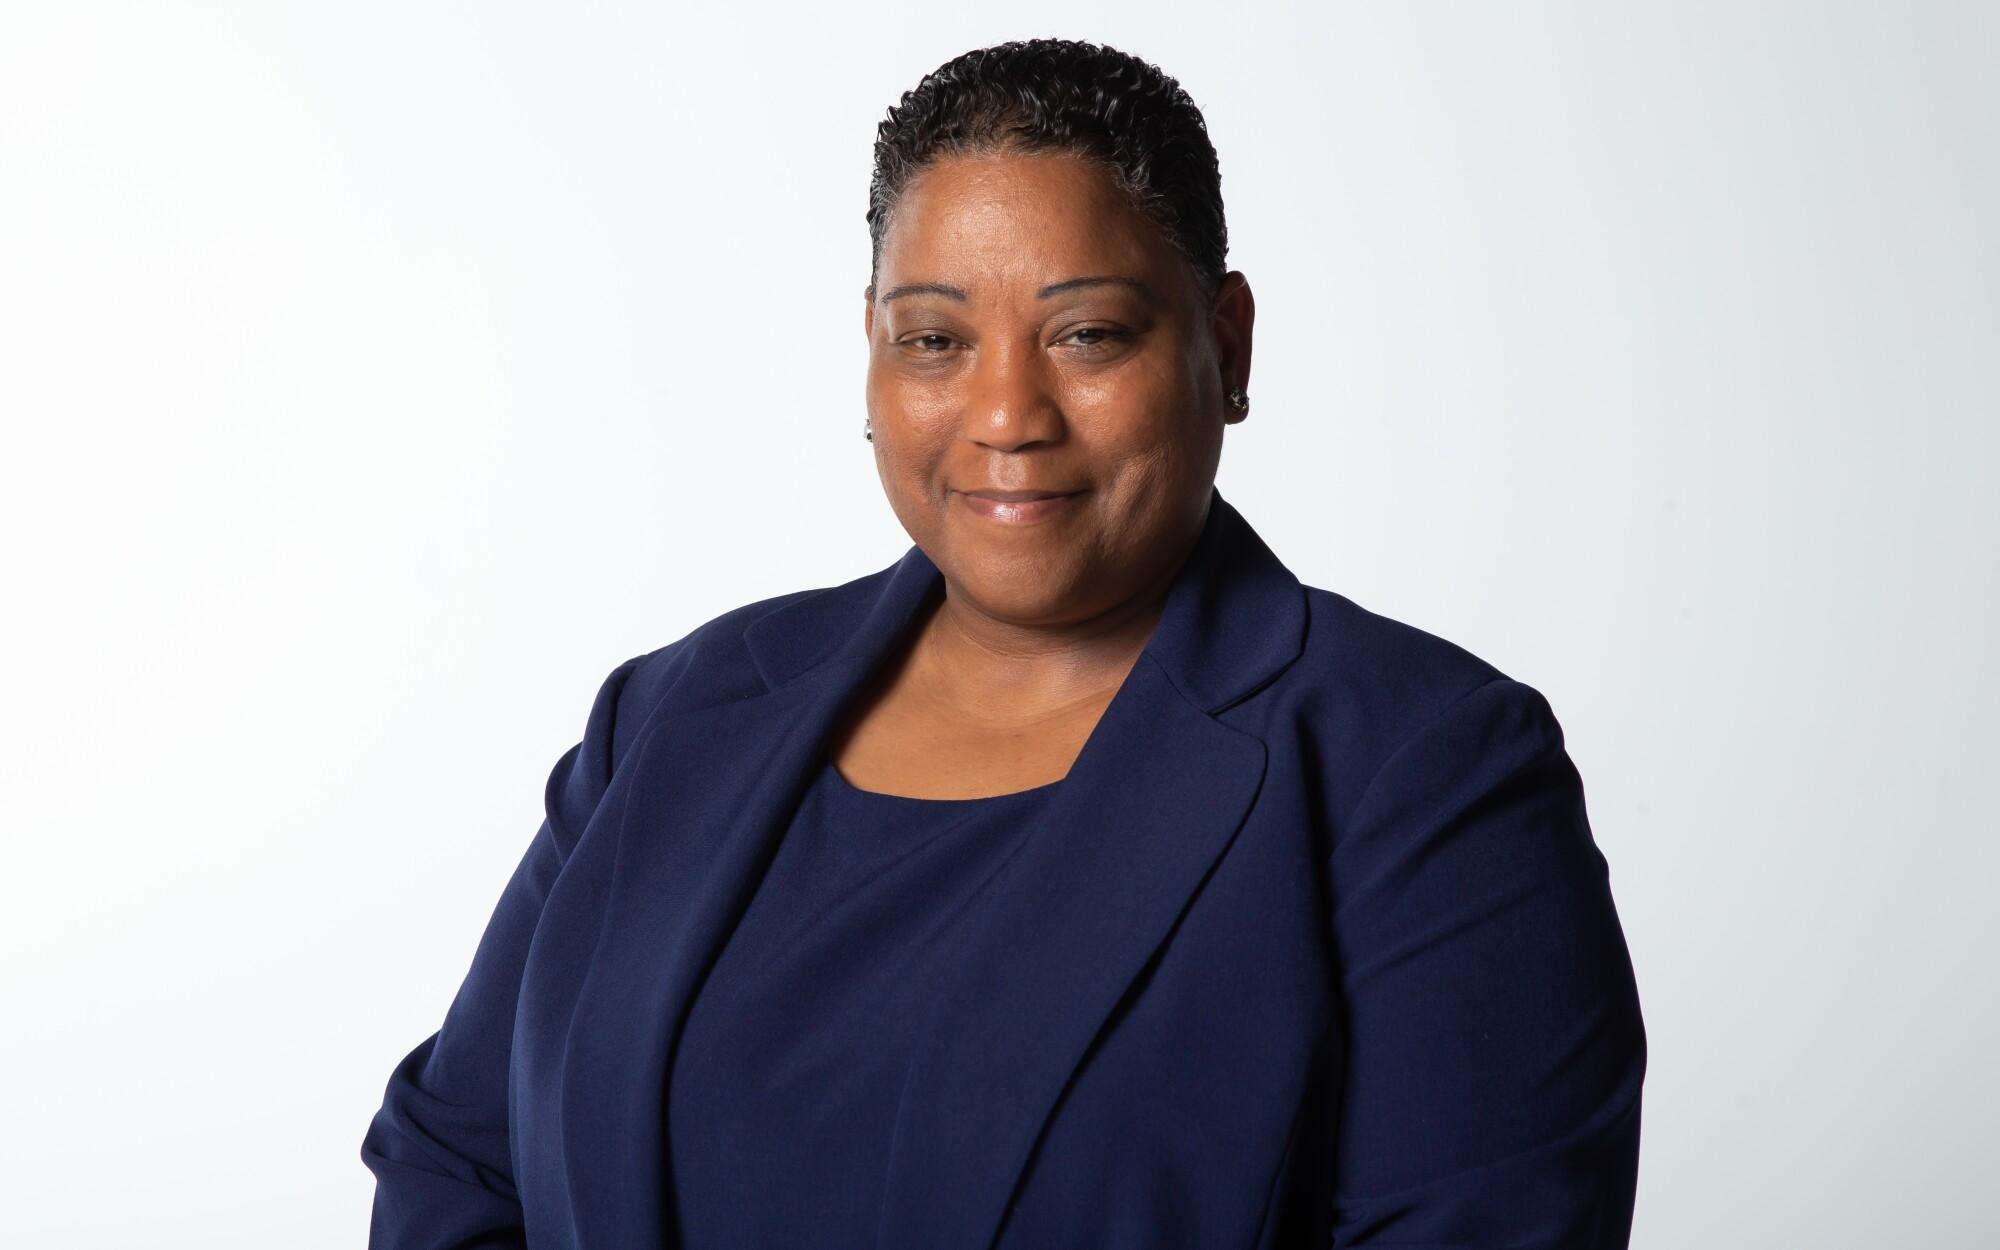 Tasha Williamson, Mayoral candidate